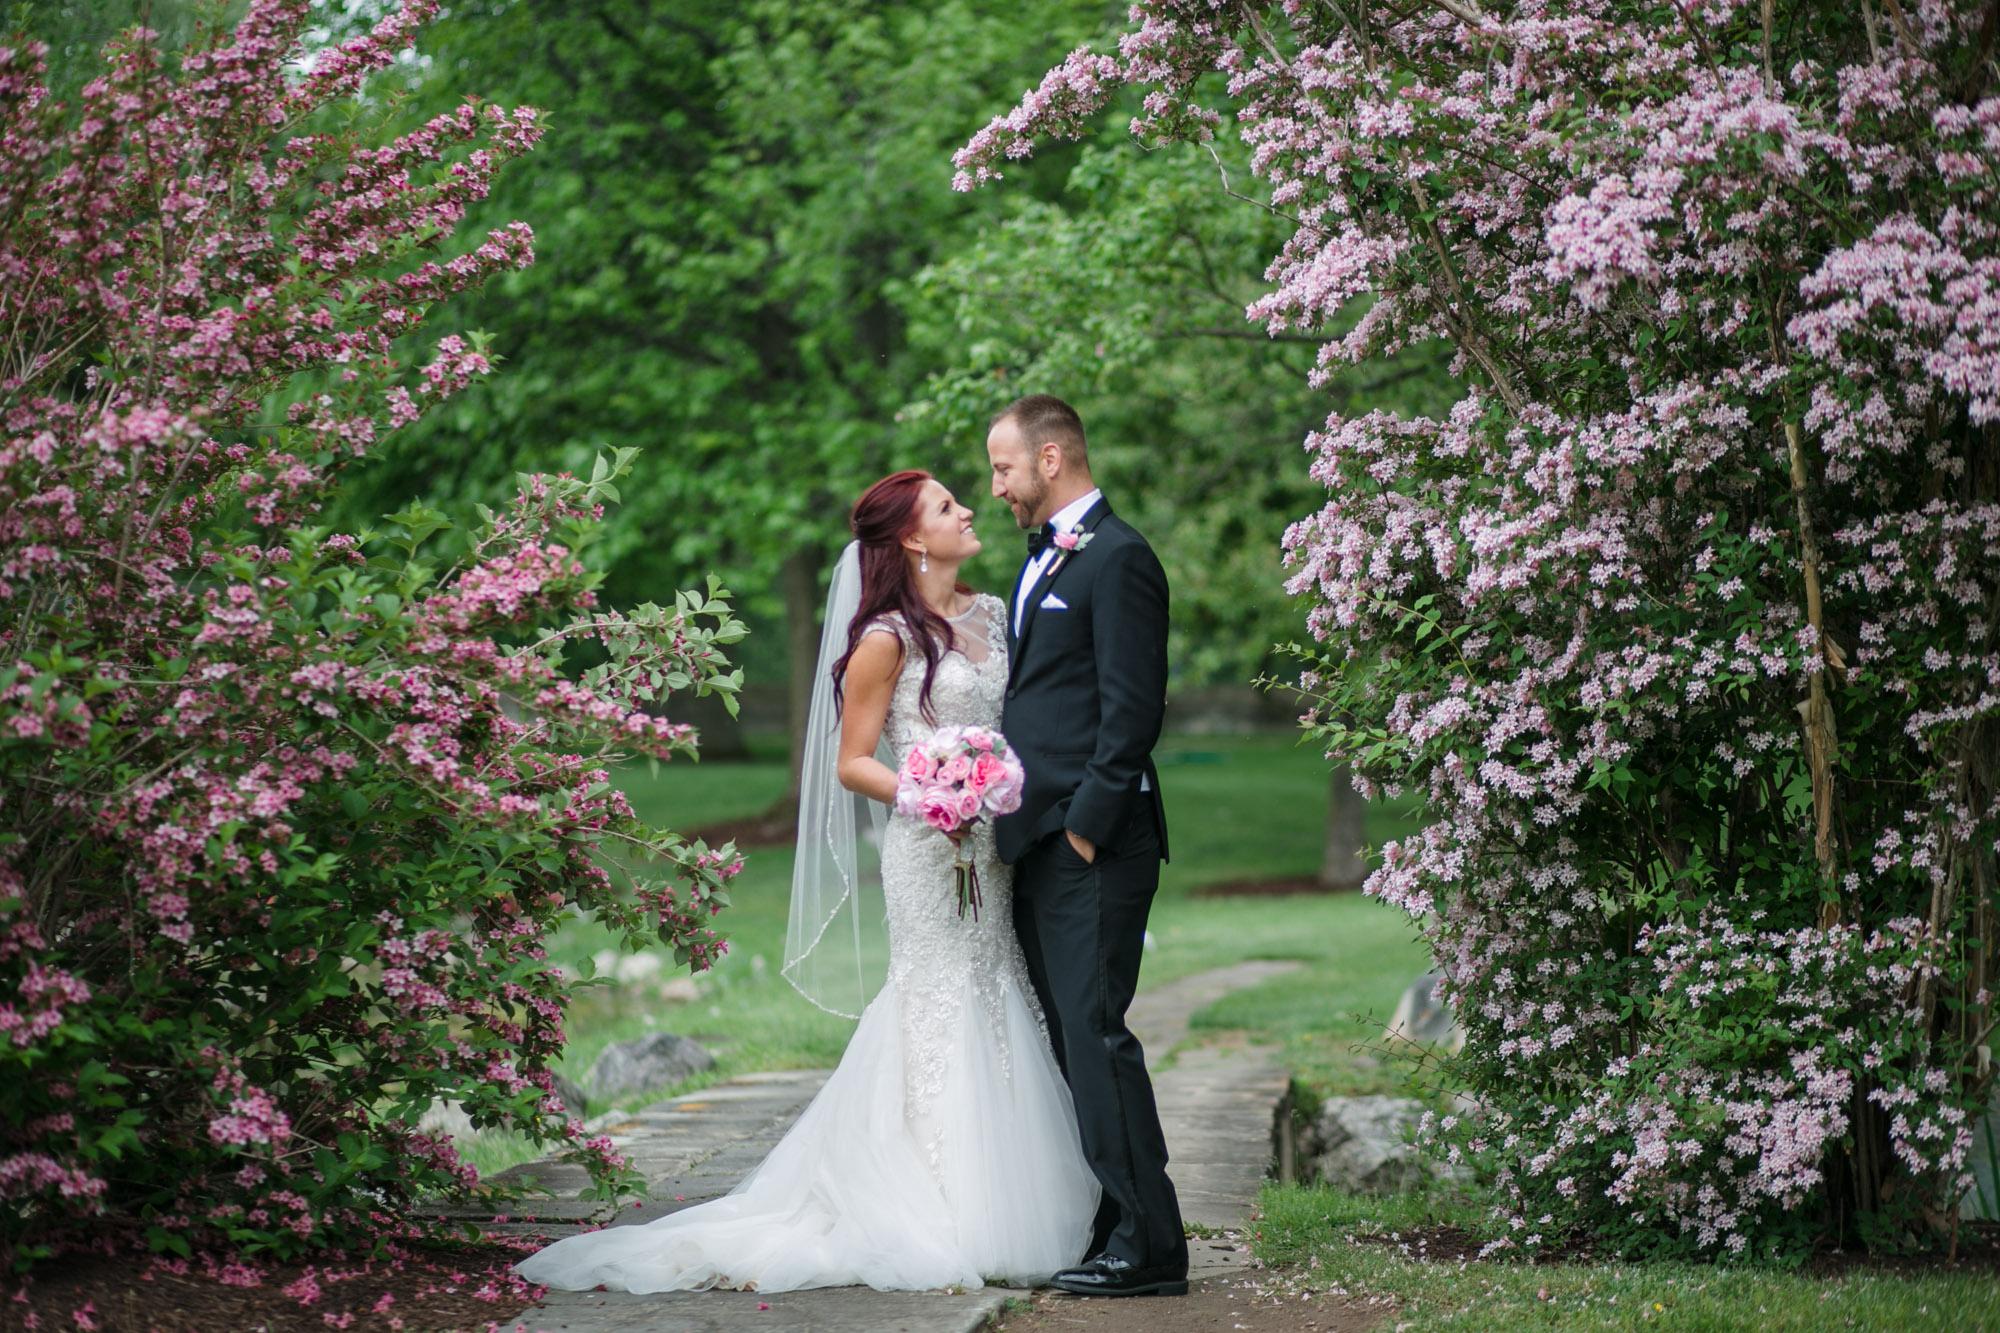 hensville-wedding-downtown-toledo-ohio (57 of 103).jpg